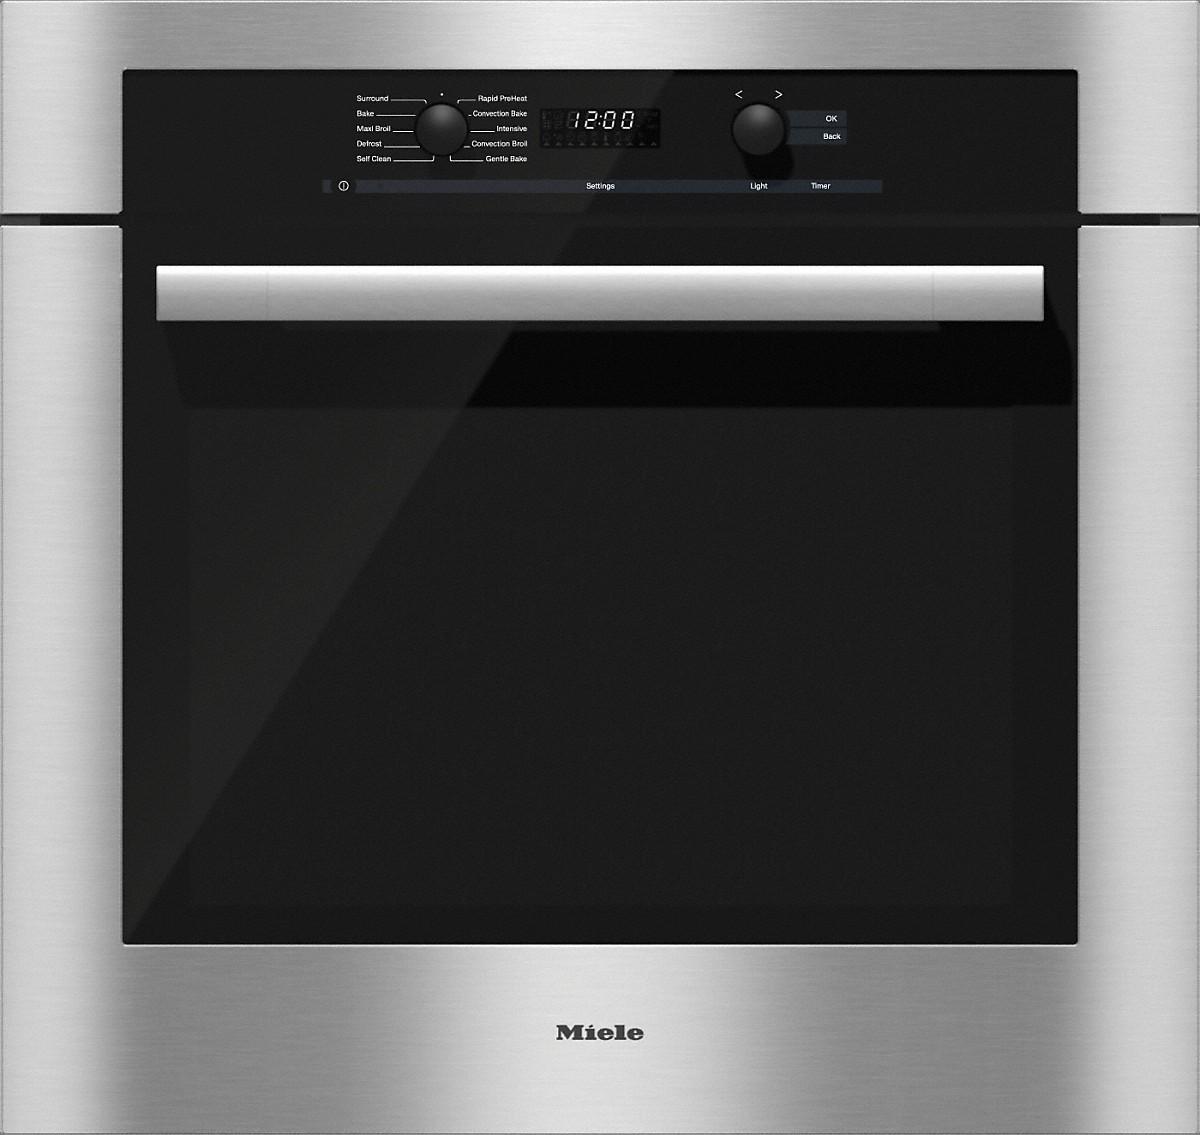 "Model: 22618053USA | Miele 30"" Direct Select Convection Oven, ContourLine"